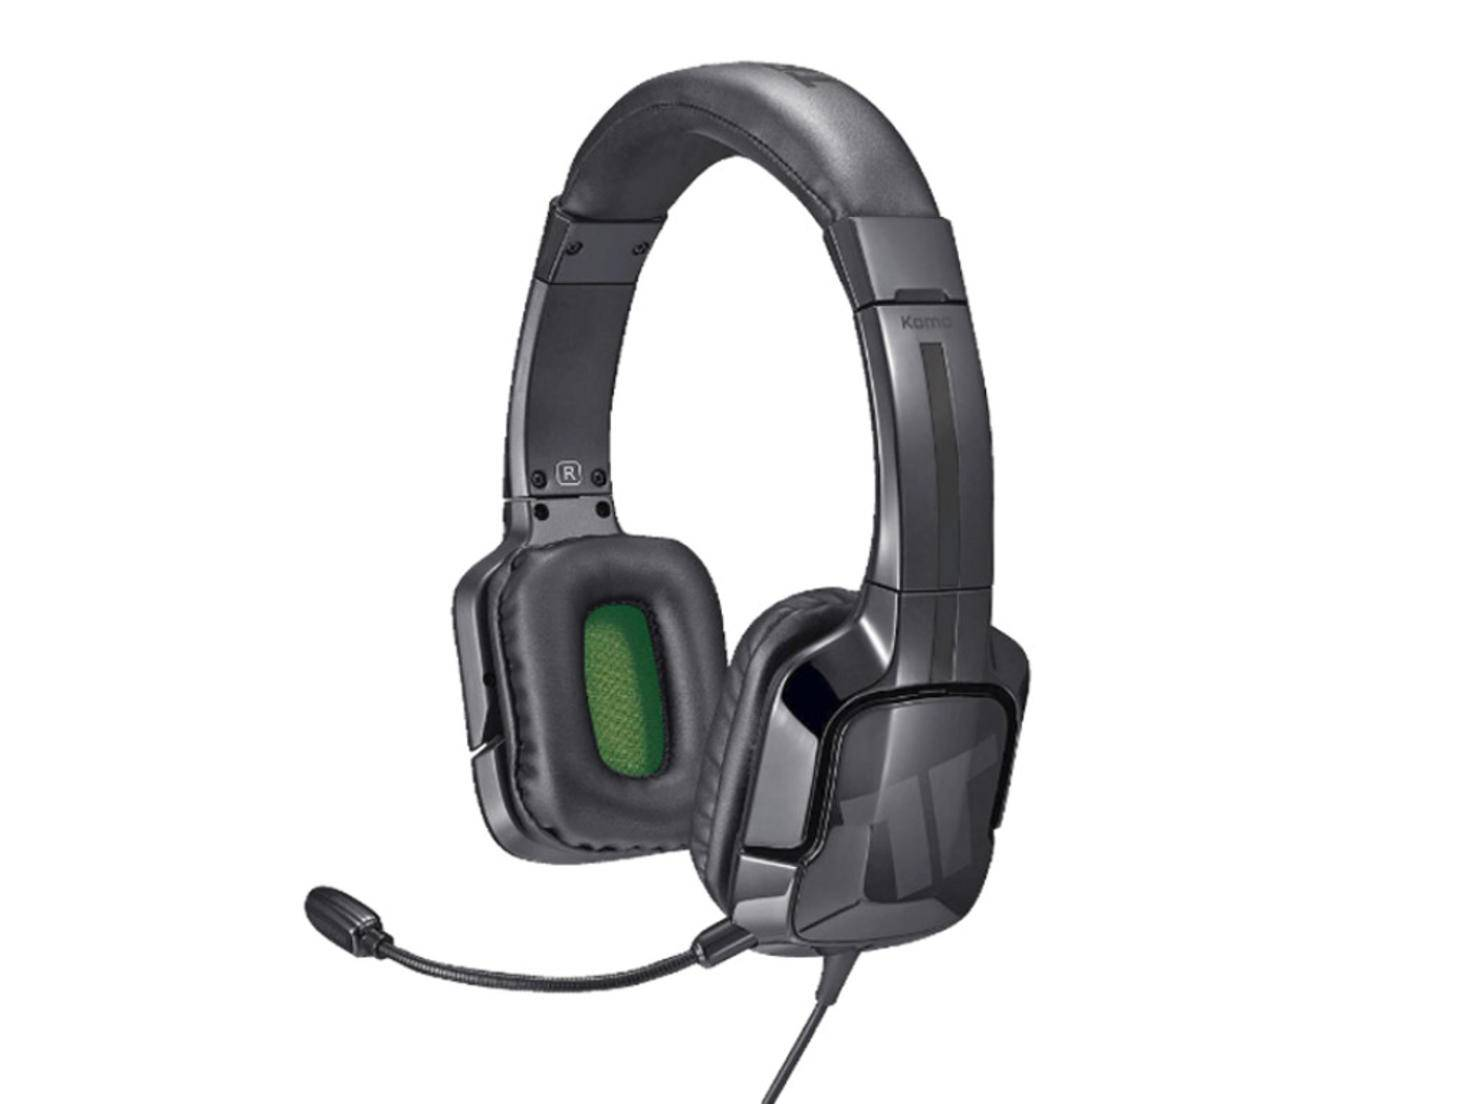 Tritton Kama Headset